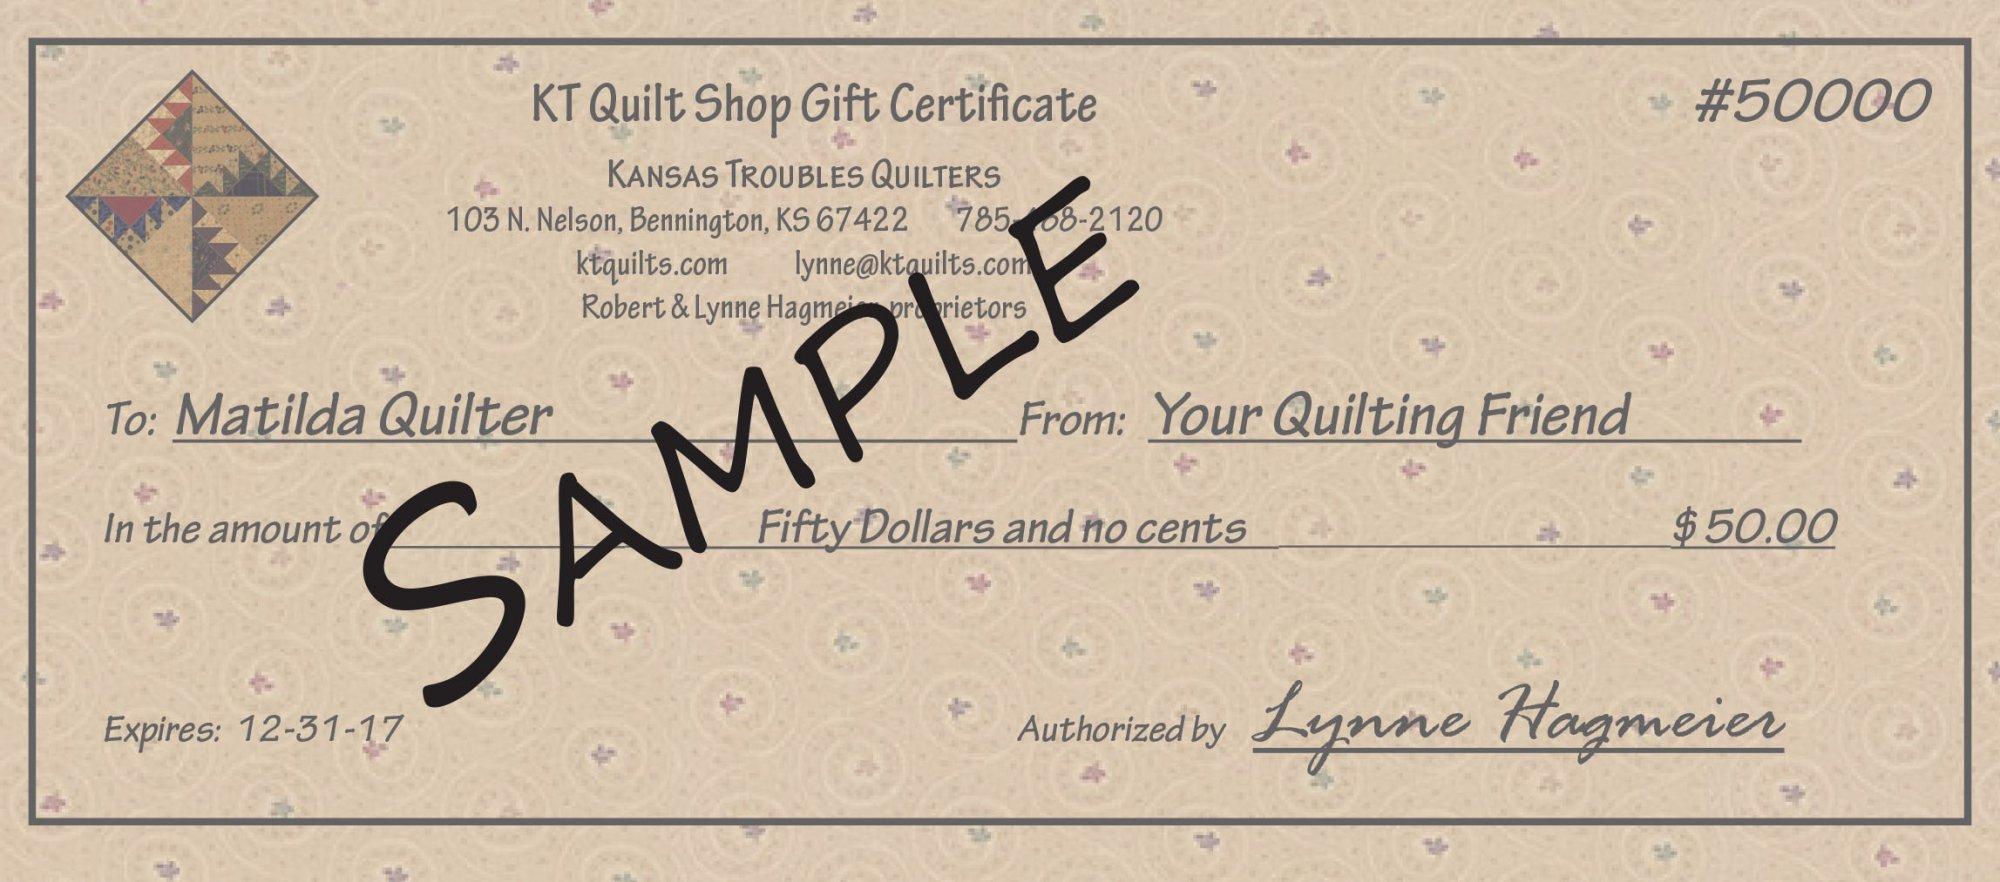 KT Gift Certificates